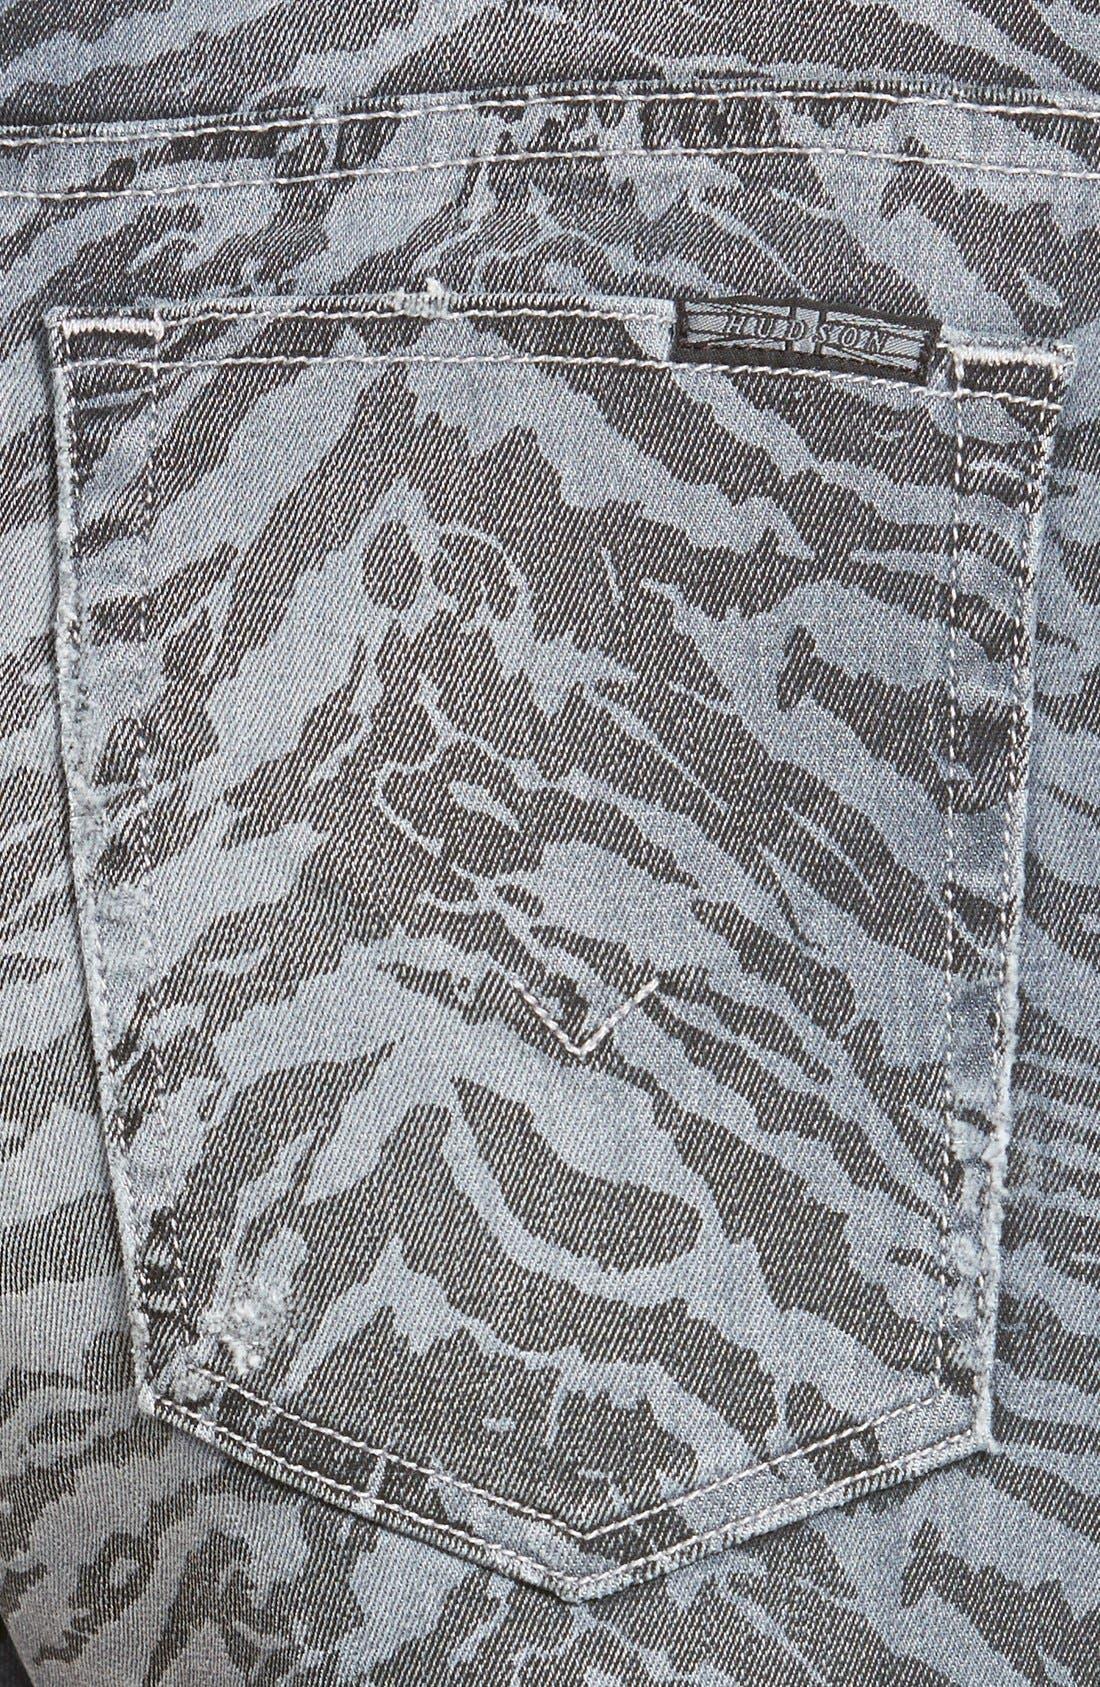 Alternate Image 3  - Hudson Jeans 'Tori Vice Versa' Cutoff Denim Shorts (Twin Coast)